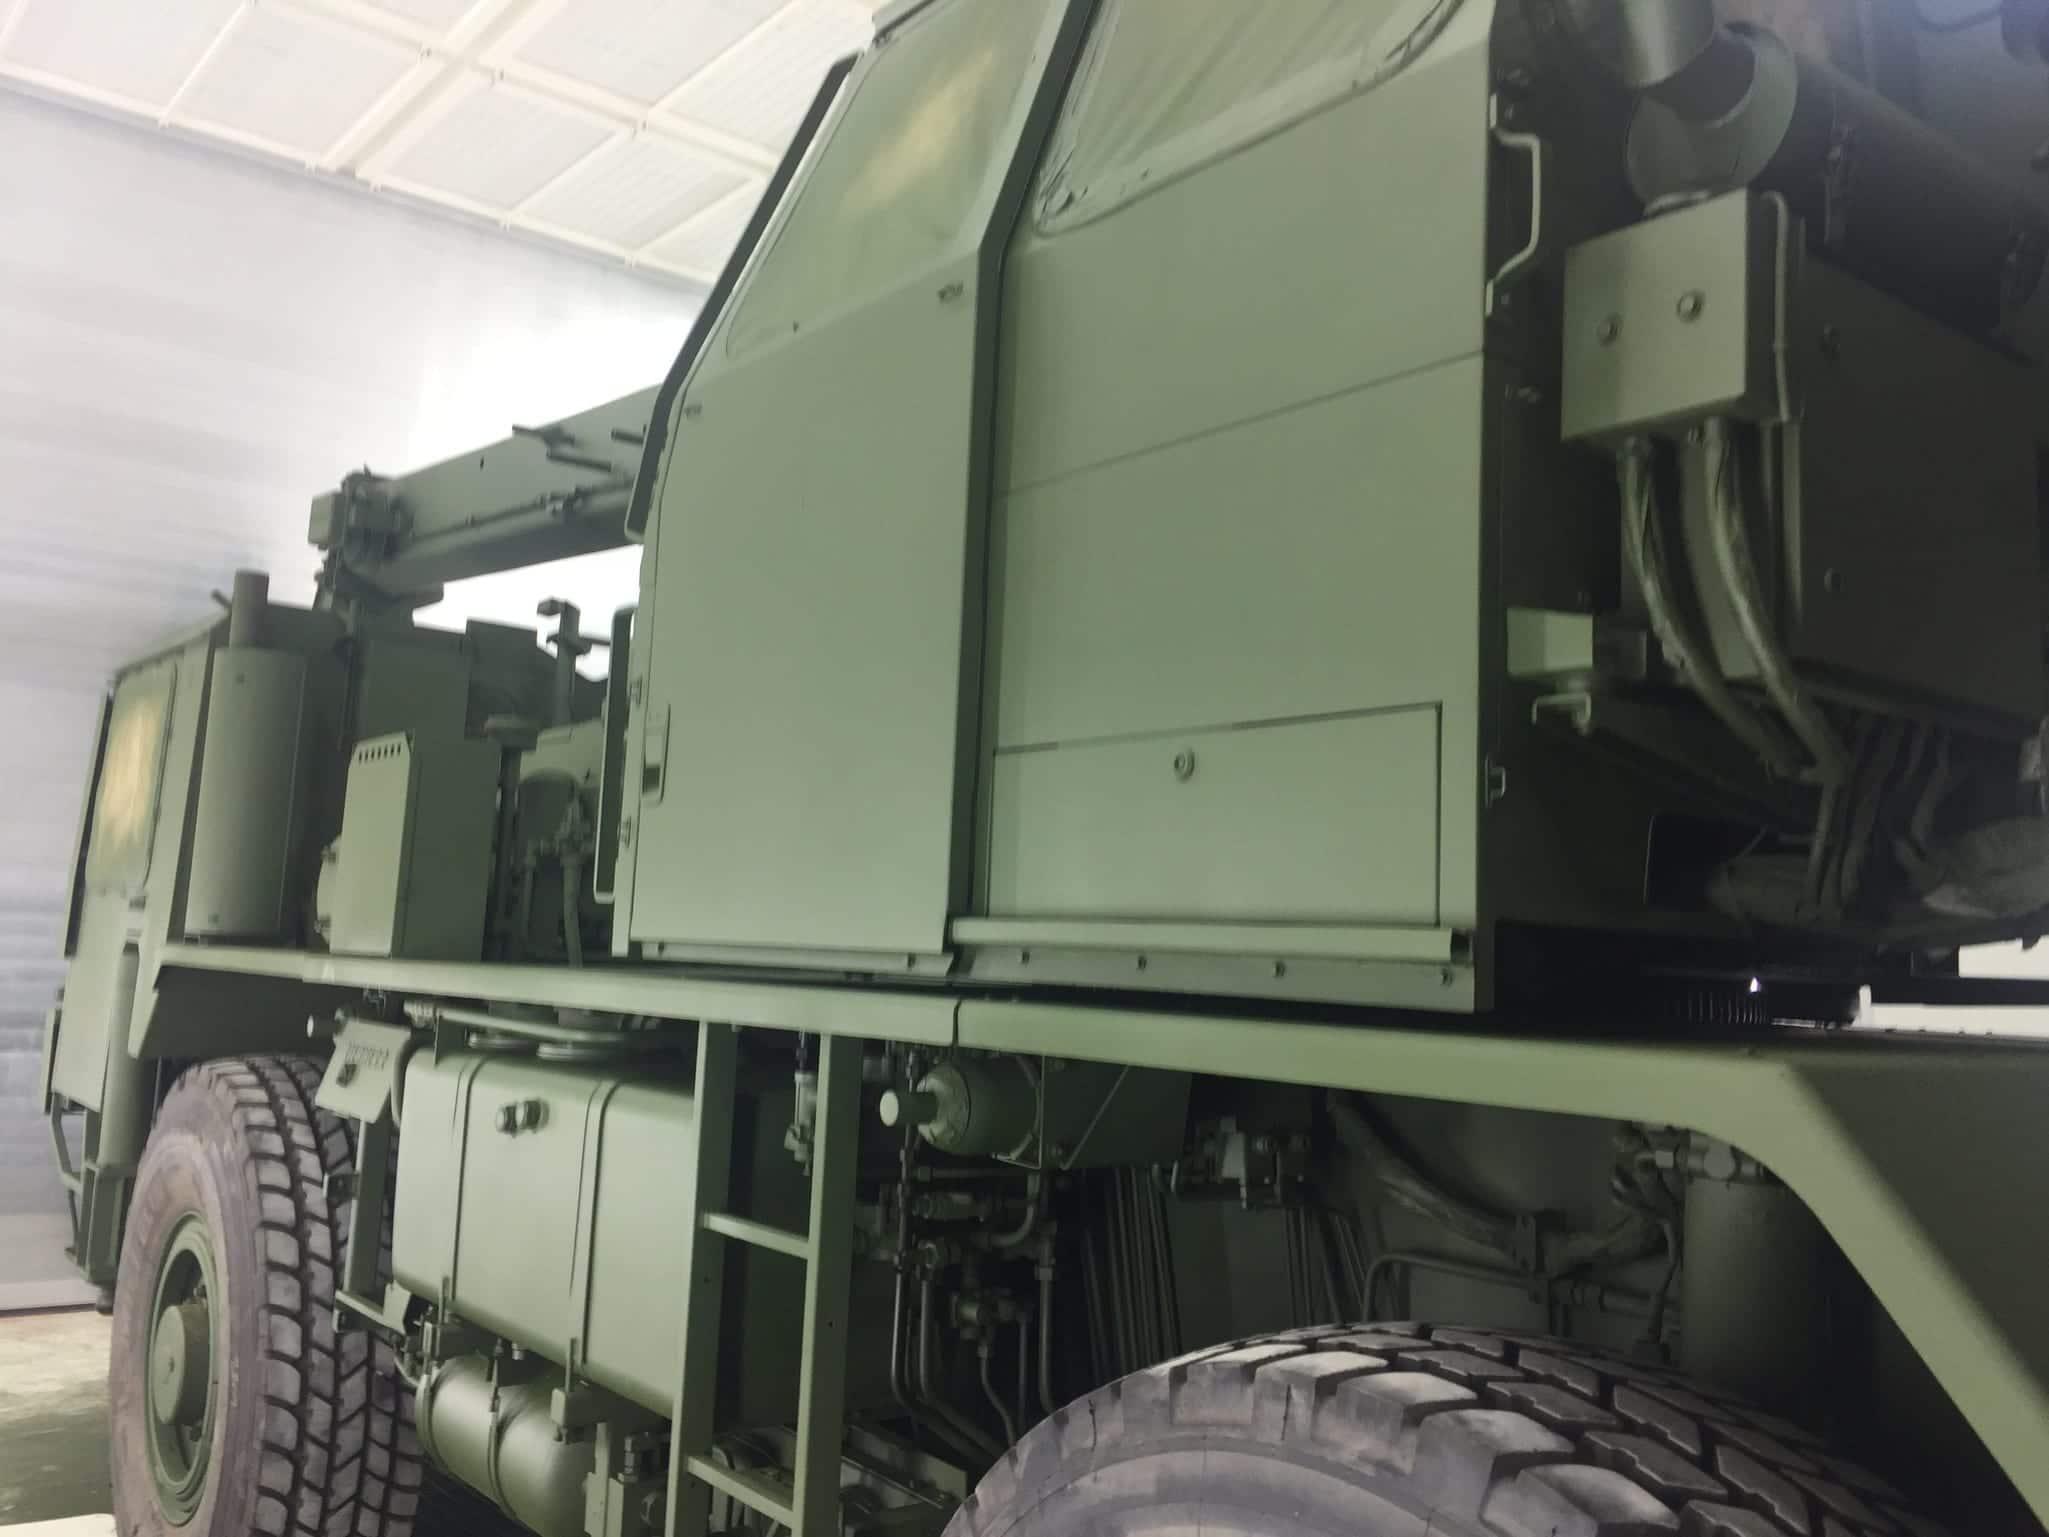 IMG 2558 - Bundeswehr Kranwagen